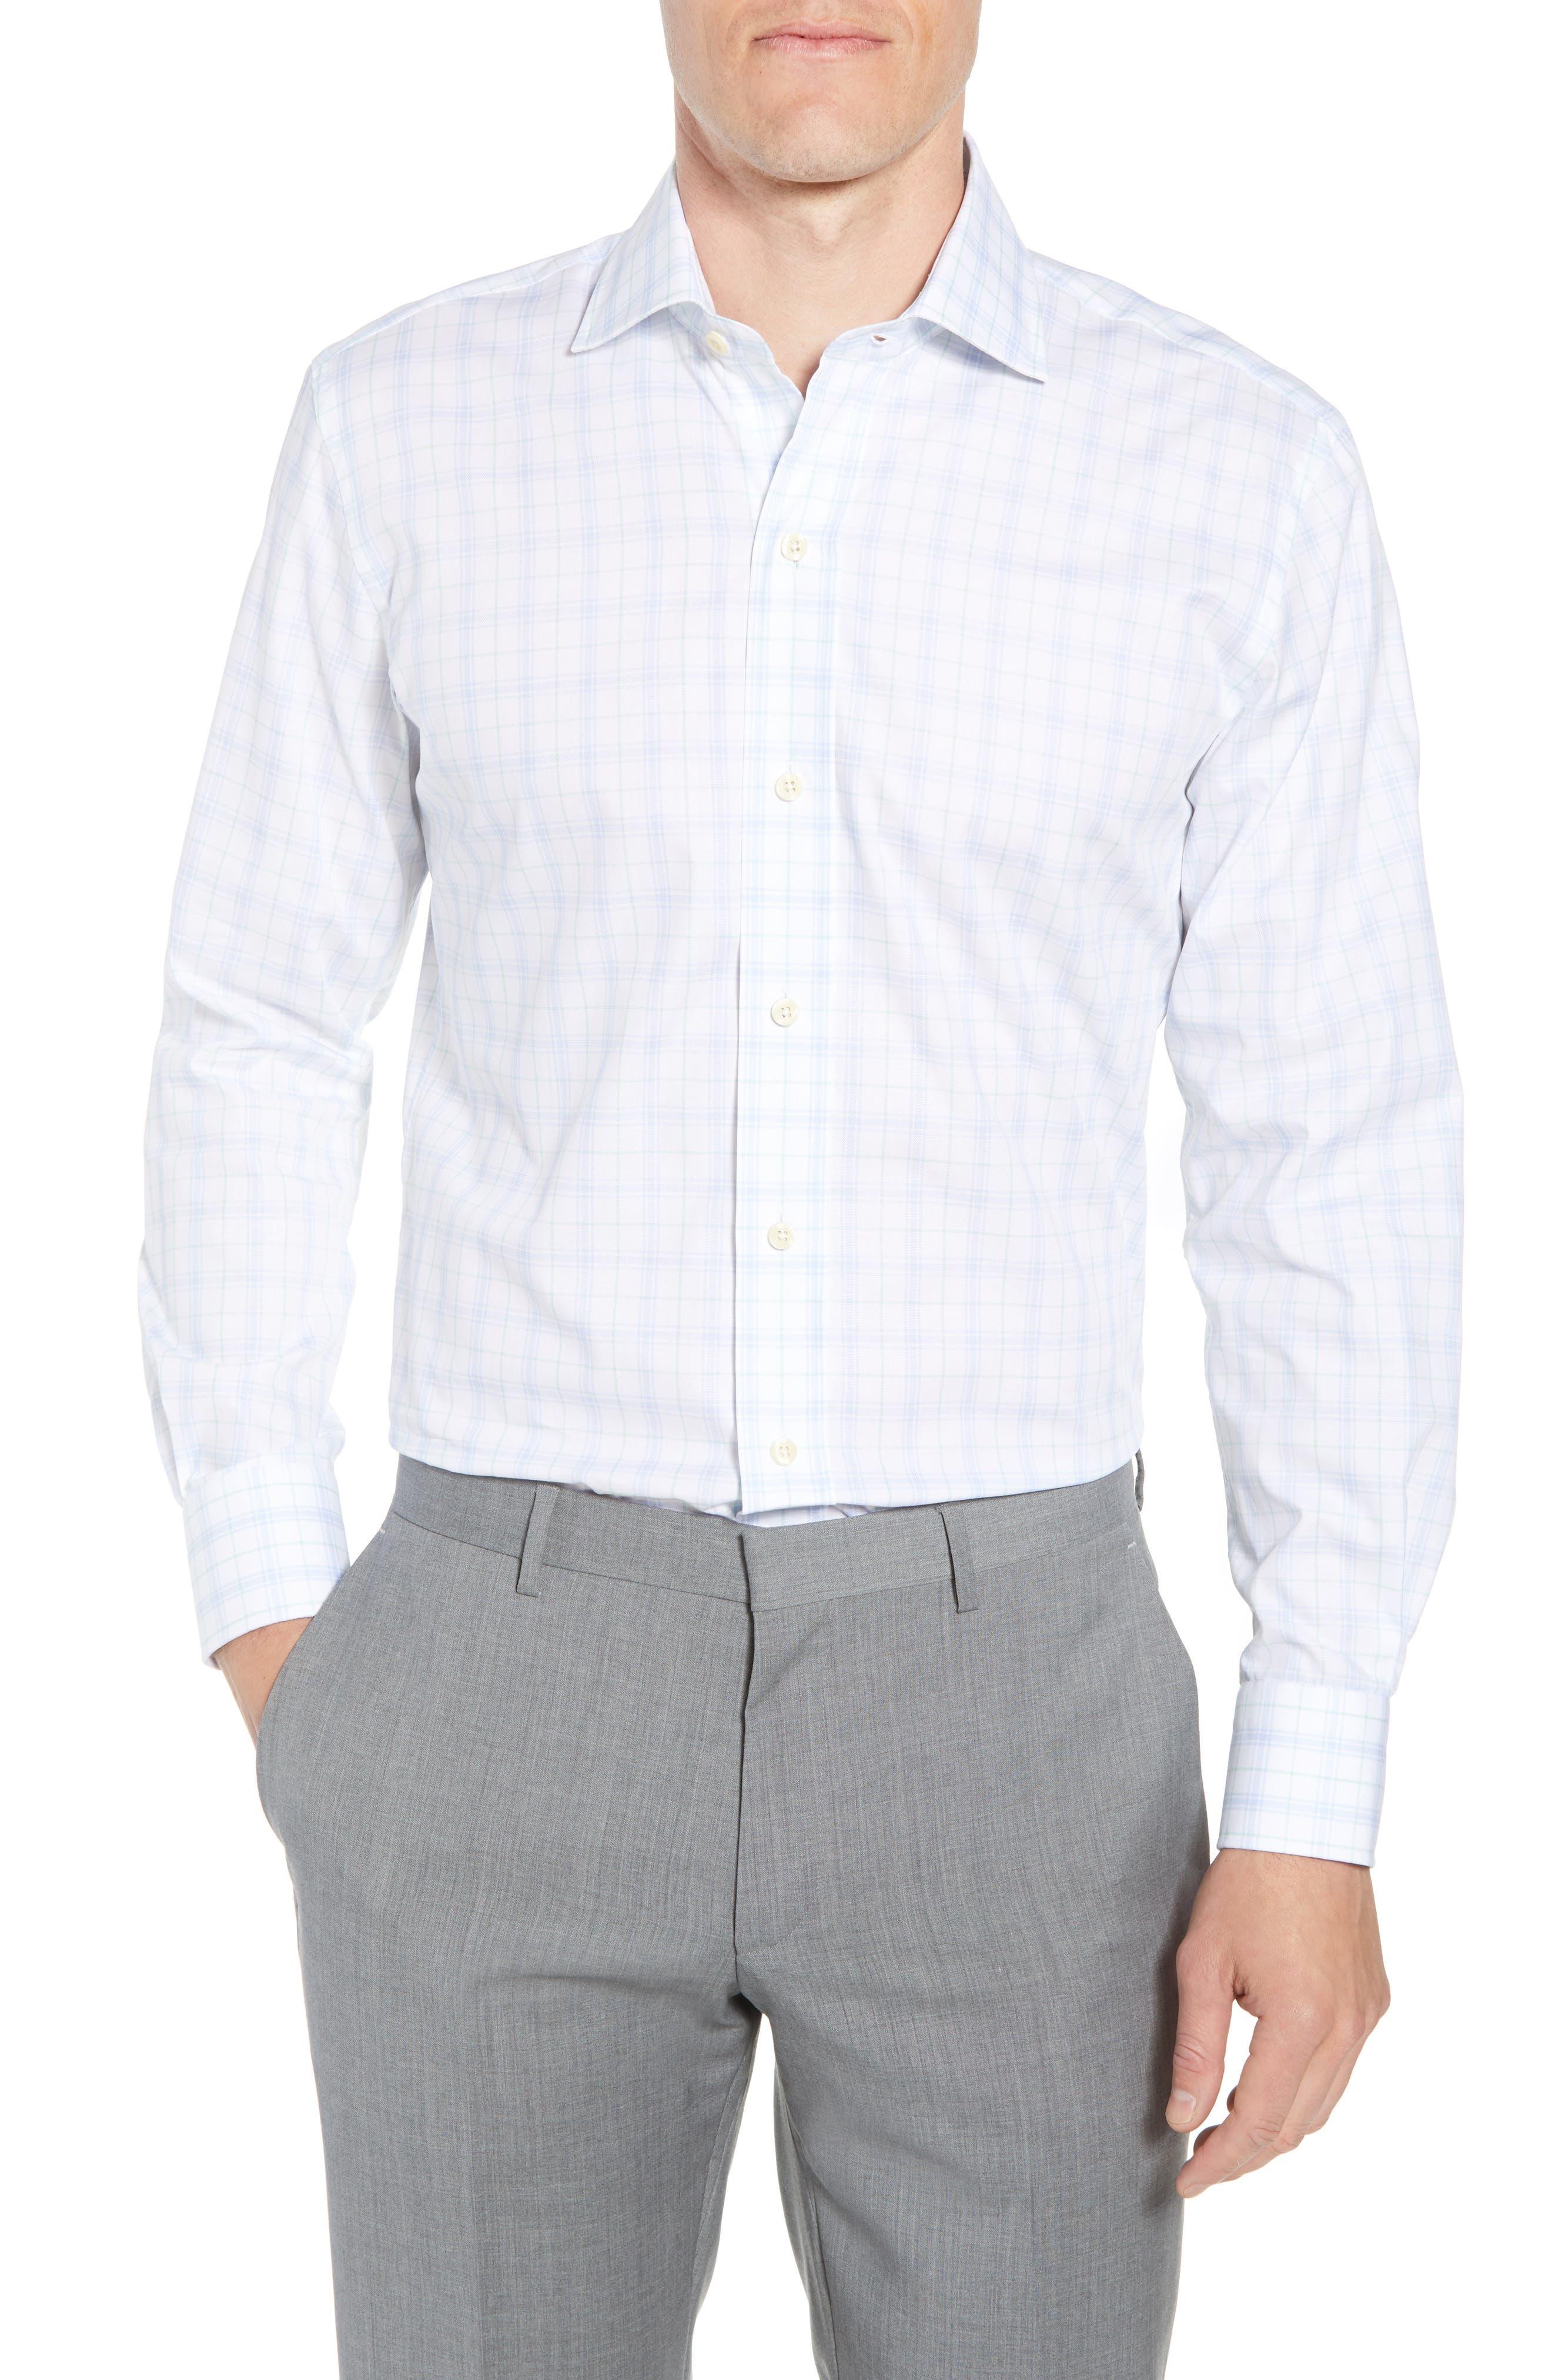 Lymann Trim Fit Plaid Dress Shirt,                             Main thumbnail 1, color,                             410